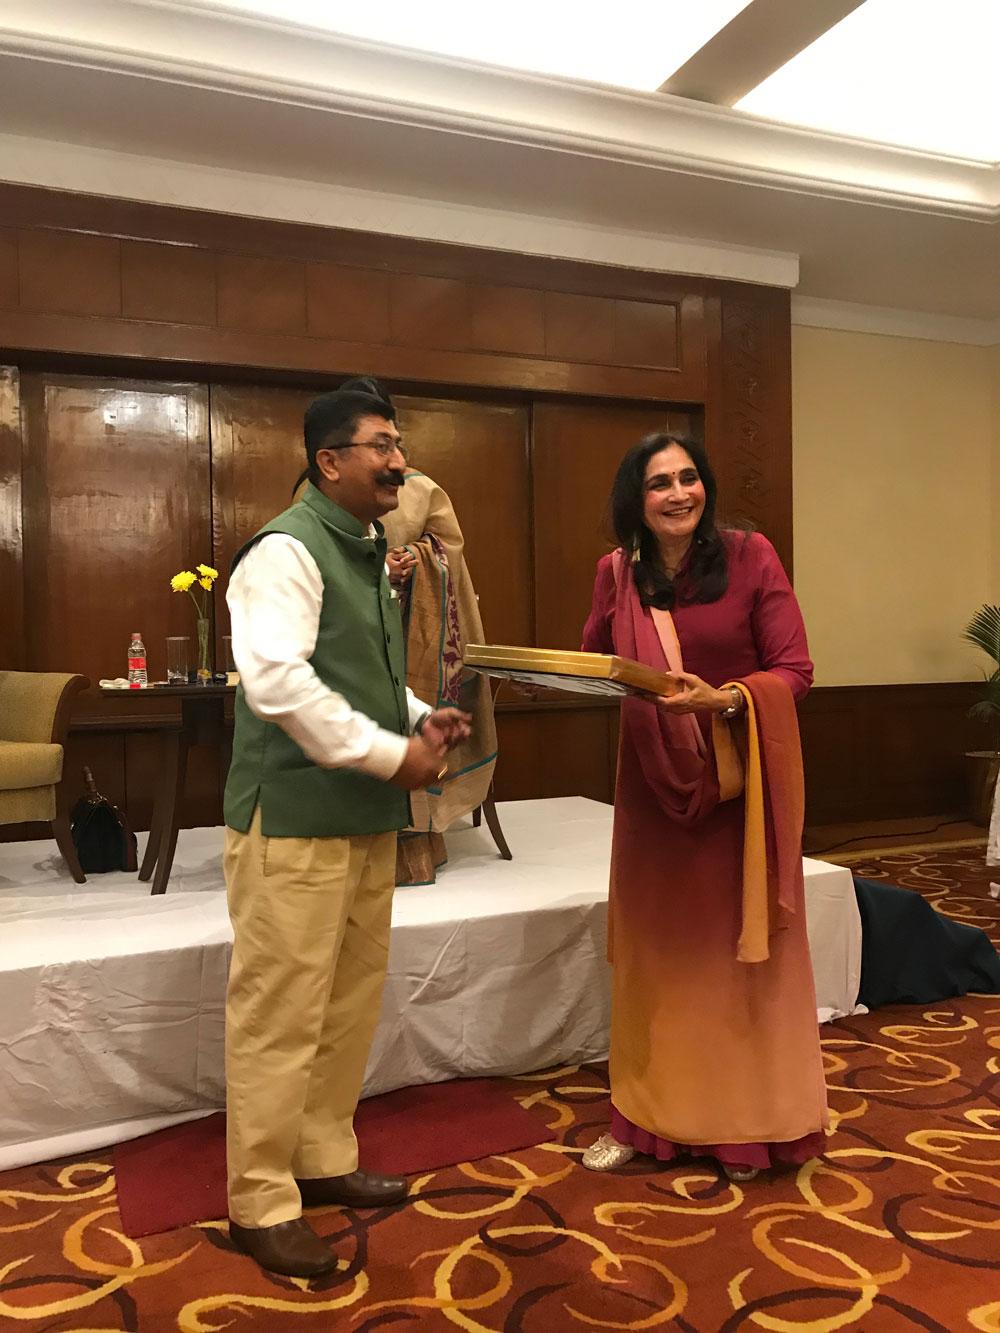 Mr.-Devendra-Ratnawat,-GM,-Taj-Hari-Mahal-Palace-presenting-memento-to-Author-Ms